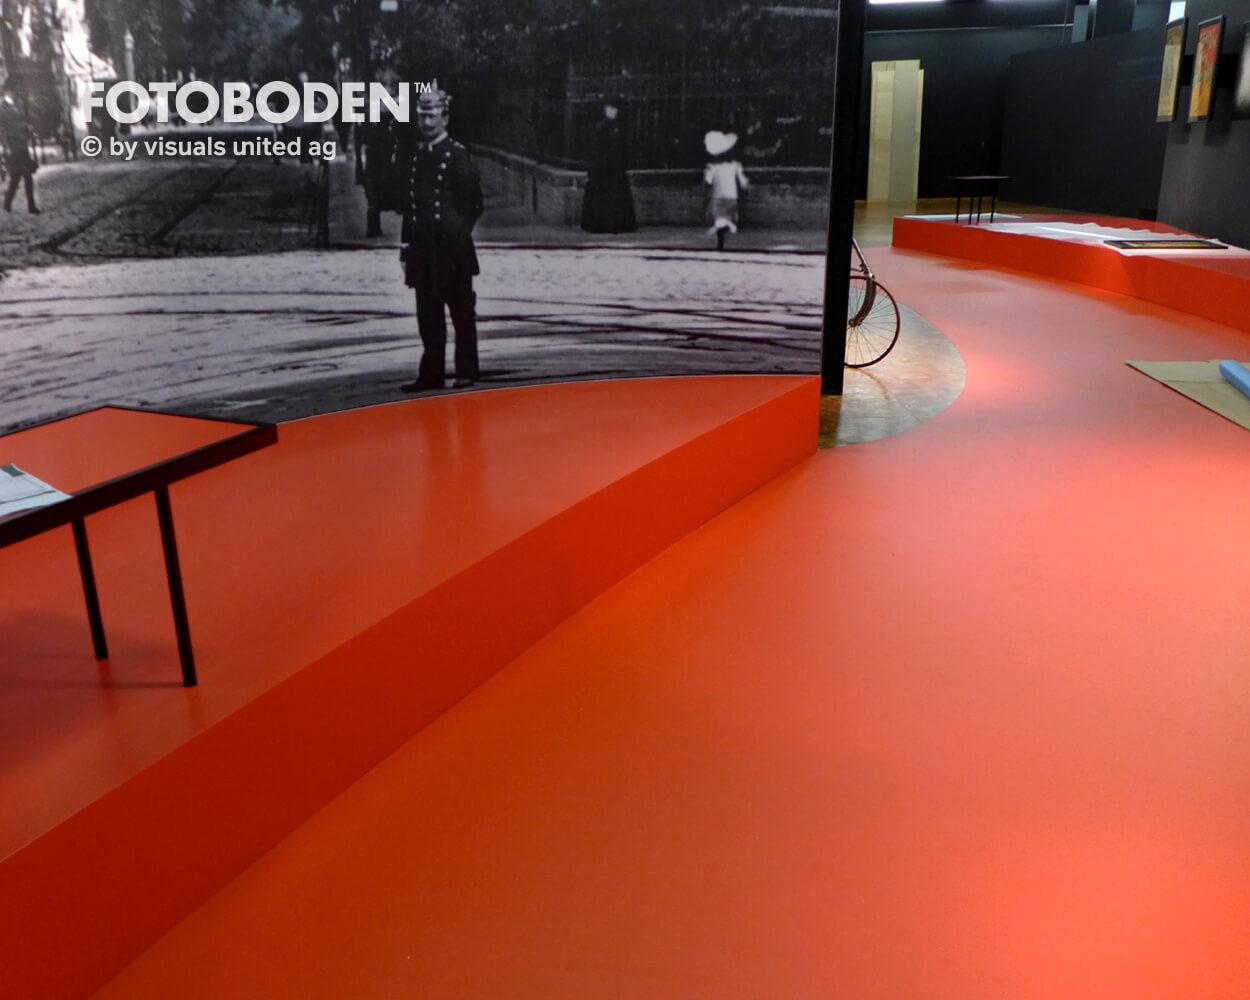 Fahrrad4 Ausstellung Museum  Raumkonzept Stimmung Museumsboden Ausstellungsboden Fotoboden Vinylboden Flooring Individuell Event